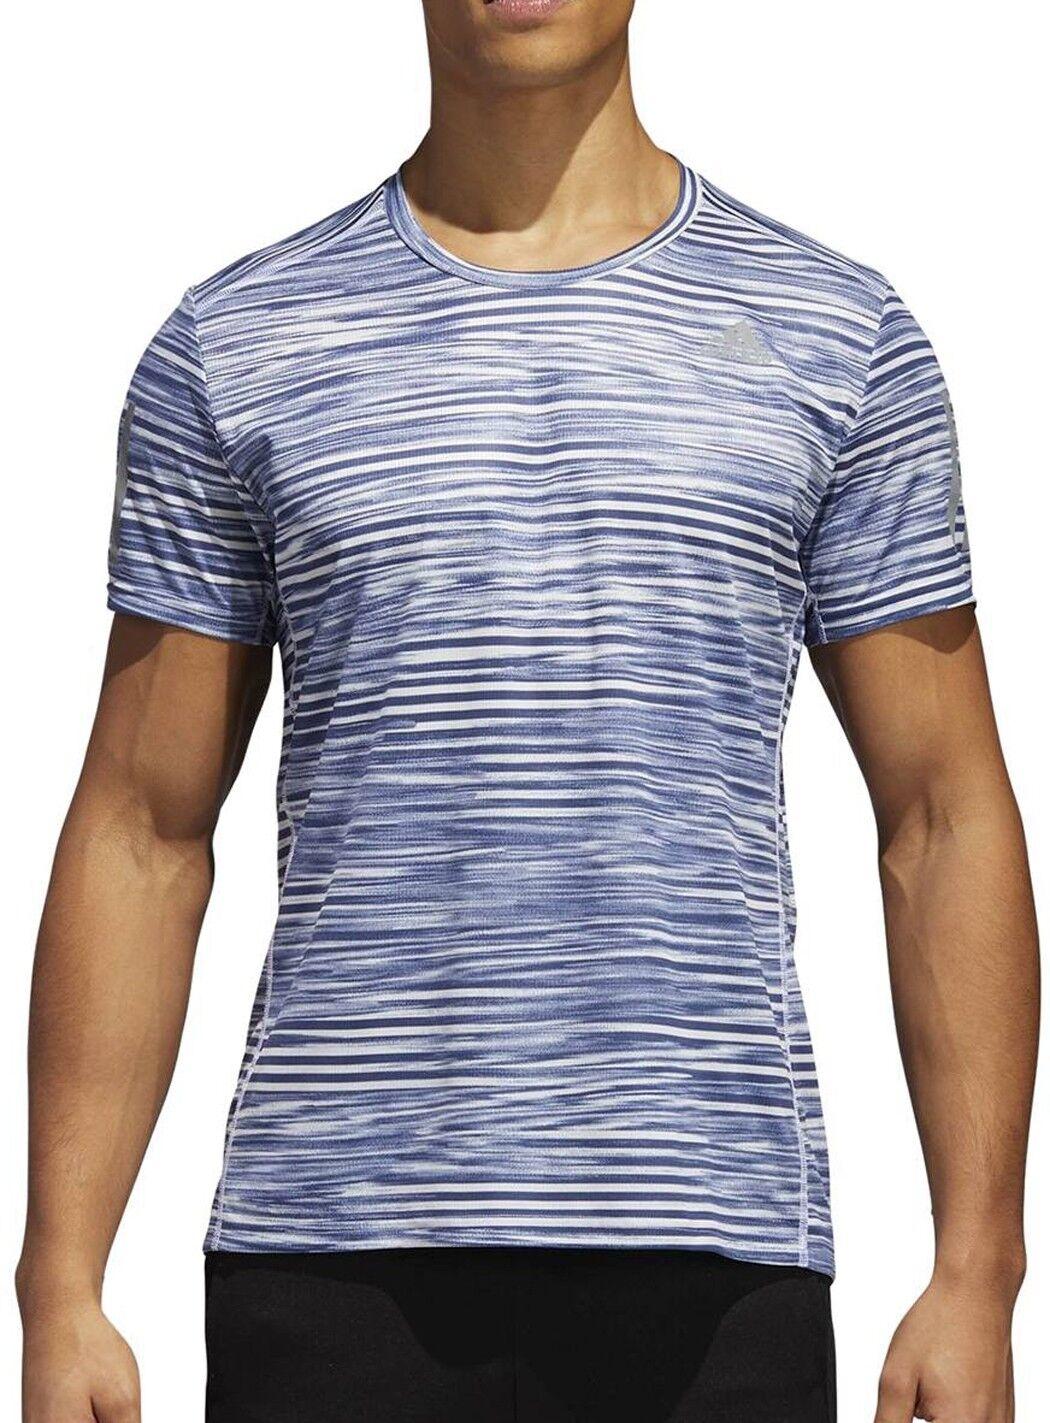 Adidas Response Print Mens Short Sleeve Running Top - bluee